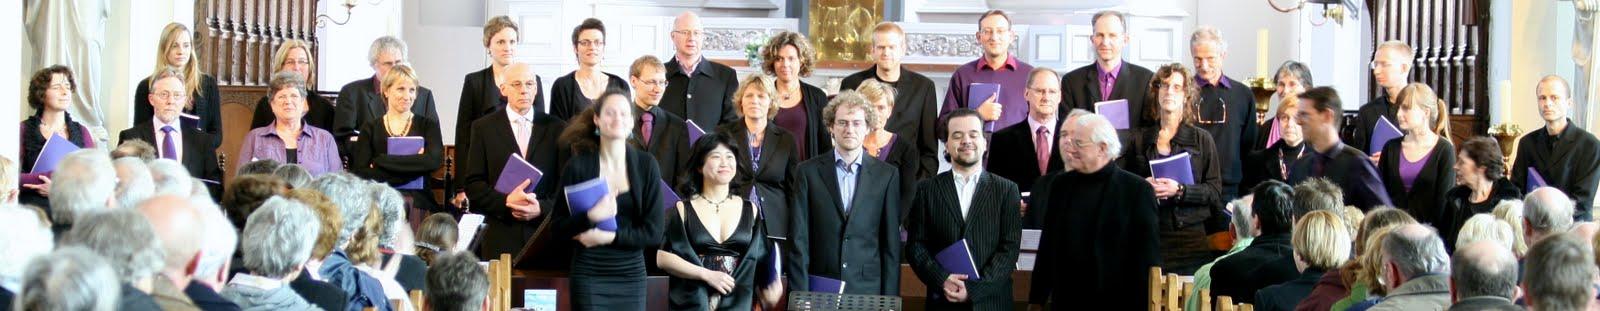 tve-rossini-mrt-2011-010a